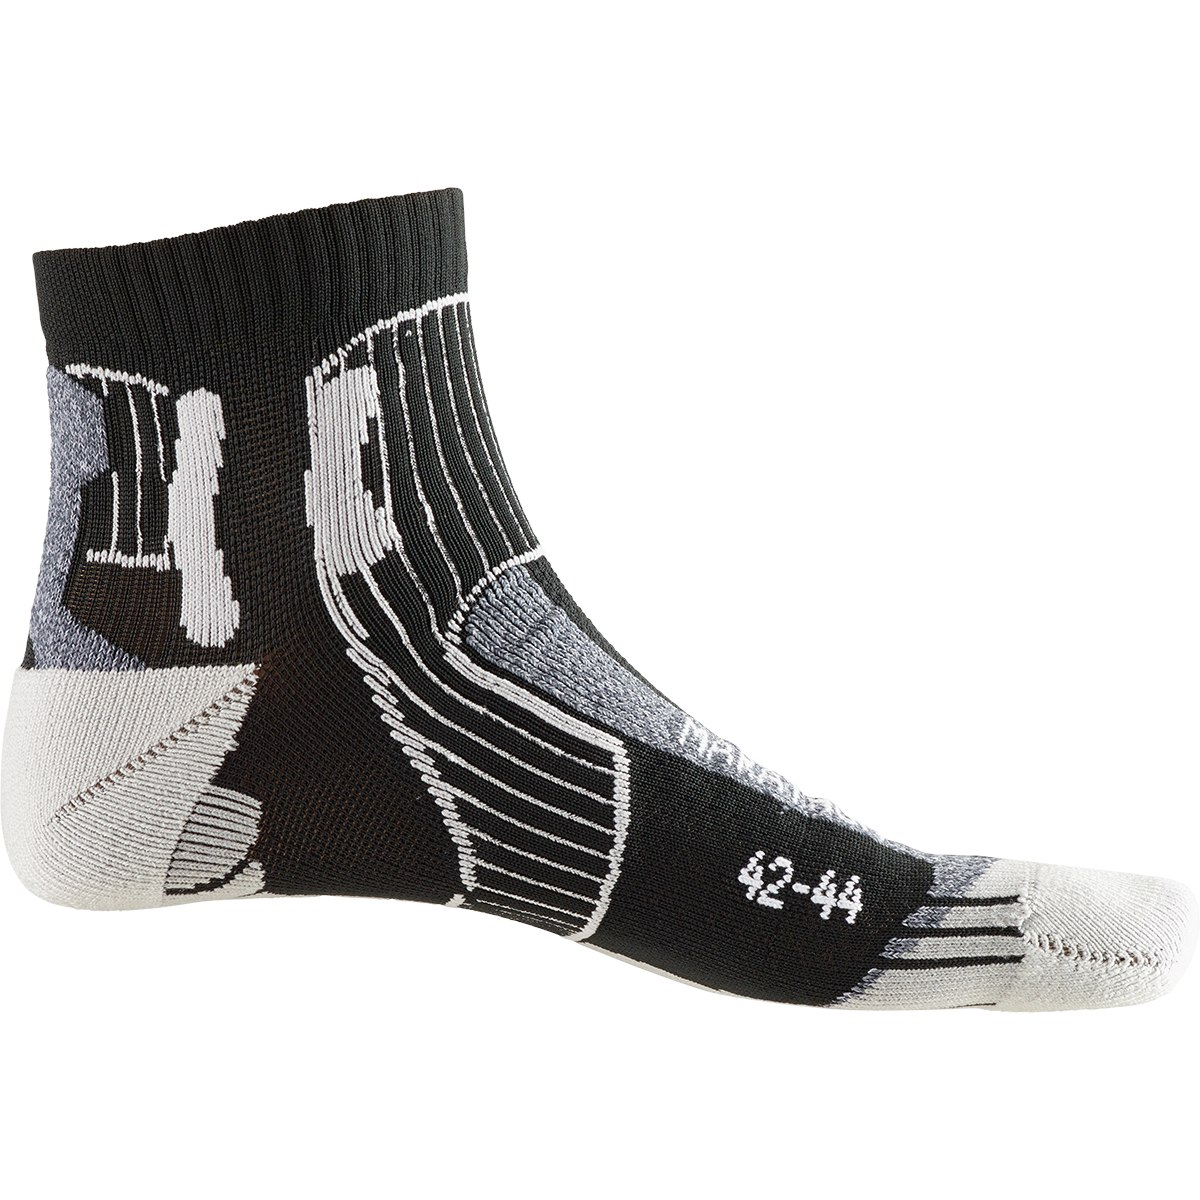 X-Socks Marathon Energy Laufsocken - black/anthracite print